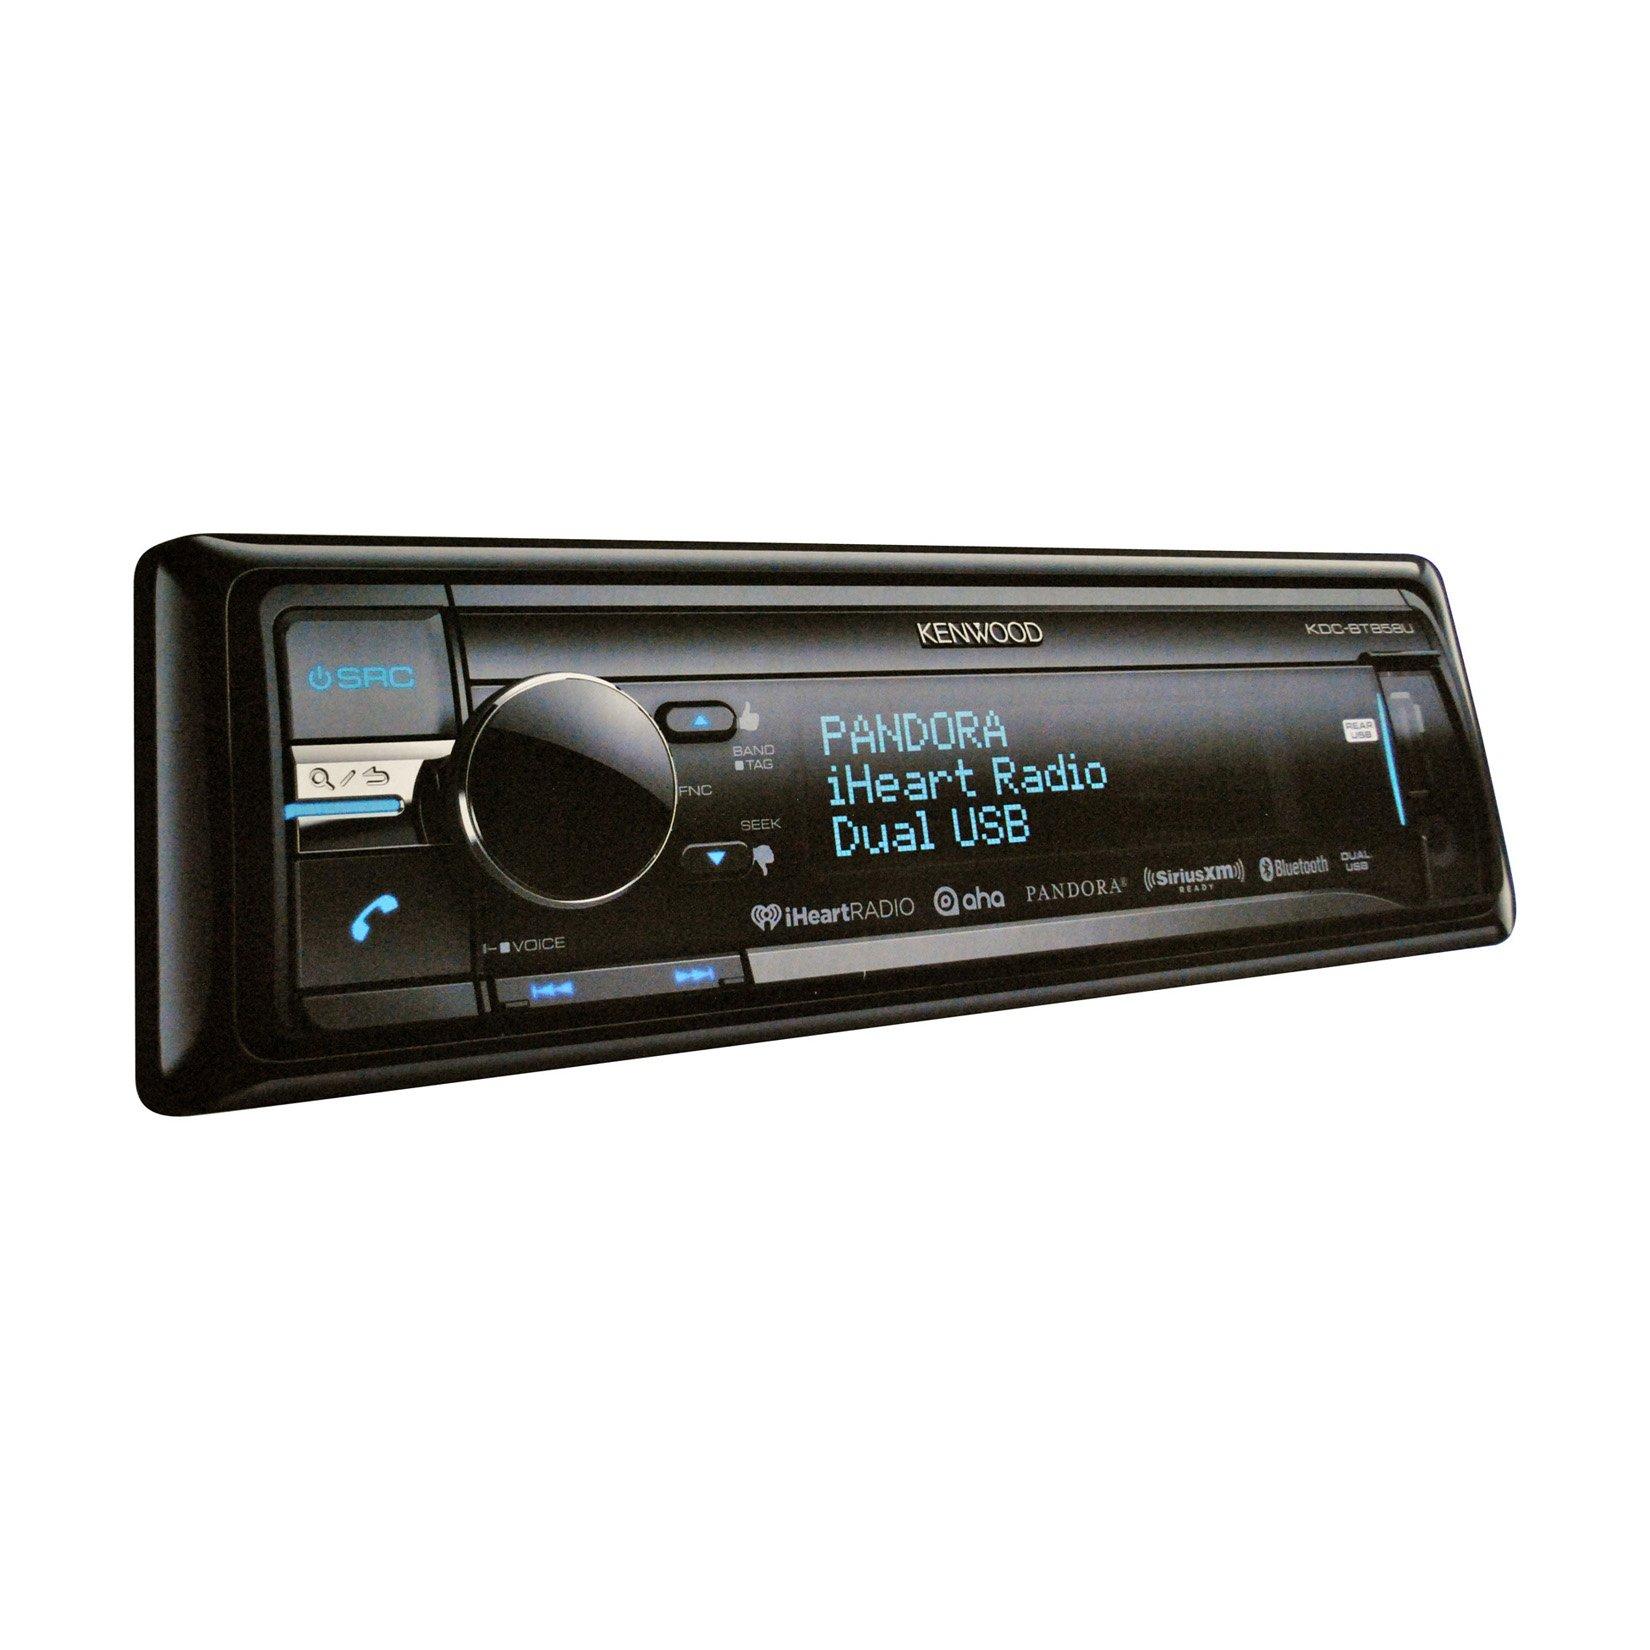 Kenwood KDC-BT858U In-Dash 1-DIN CD/MP3 Receiver with Bluetooth